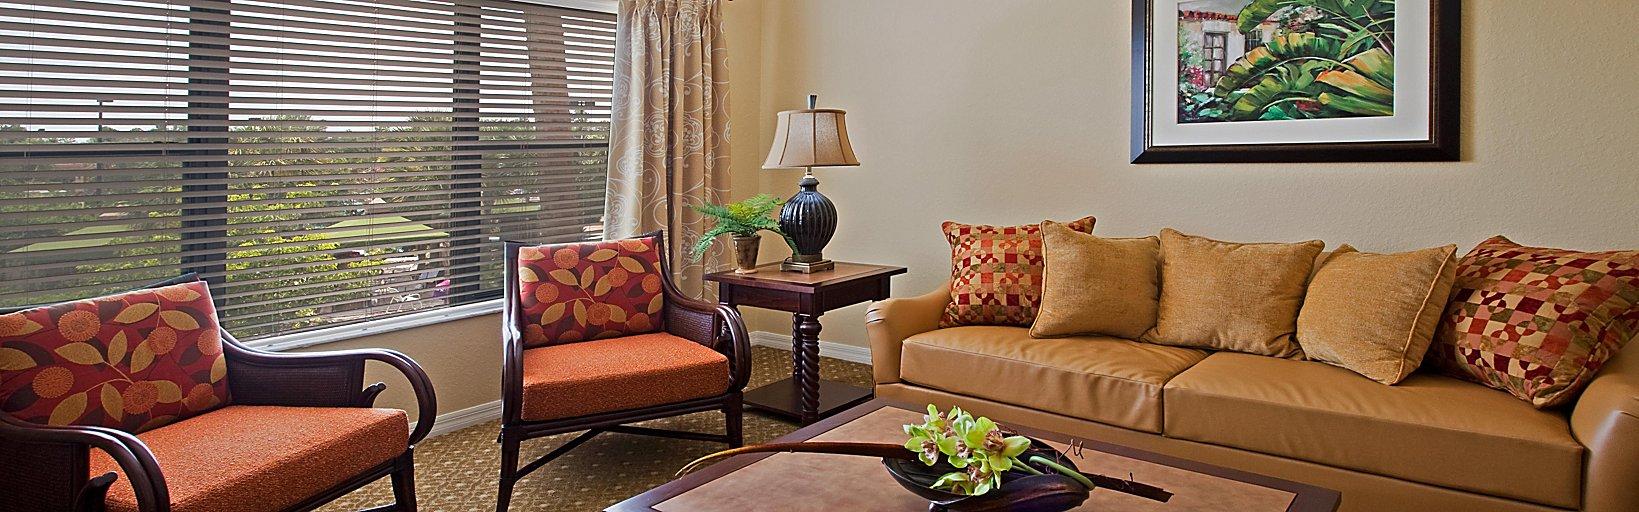 Awe Inspiring Holiday Inn Club Vacations Orange Lake Resort Hotel Pdpeps Interior Chair Design Pdpepsorg